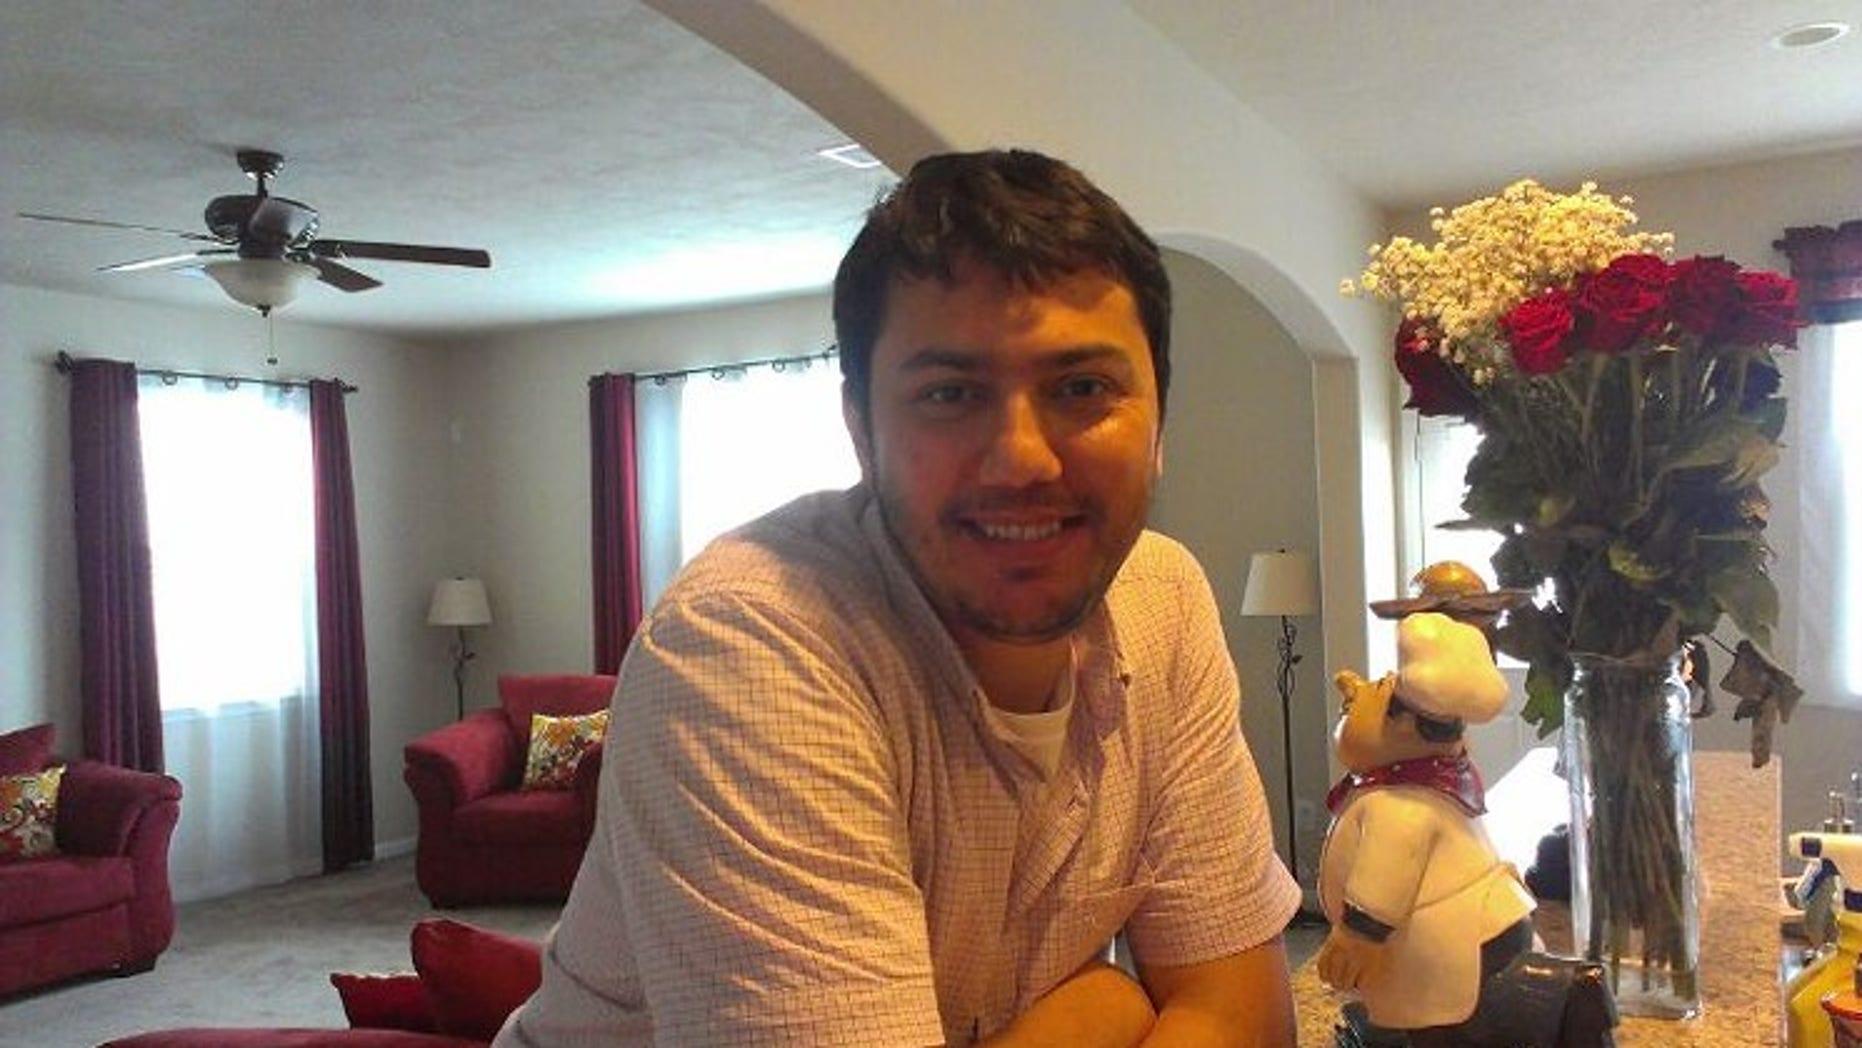 NASA scientist Serkan Golge, a dual Turkish-American citizen, remains behind bars in Turkey.